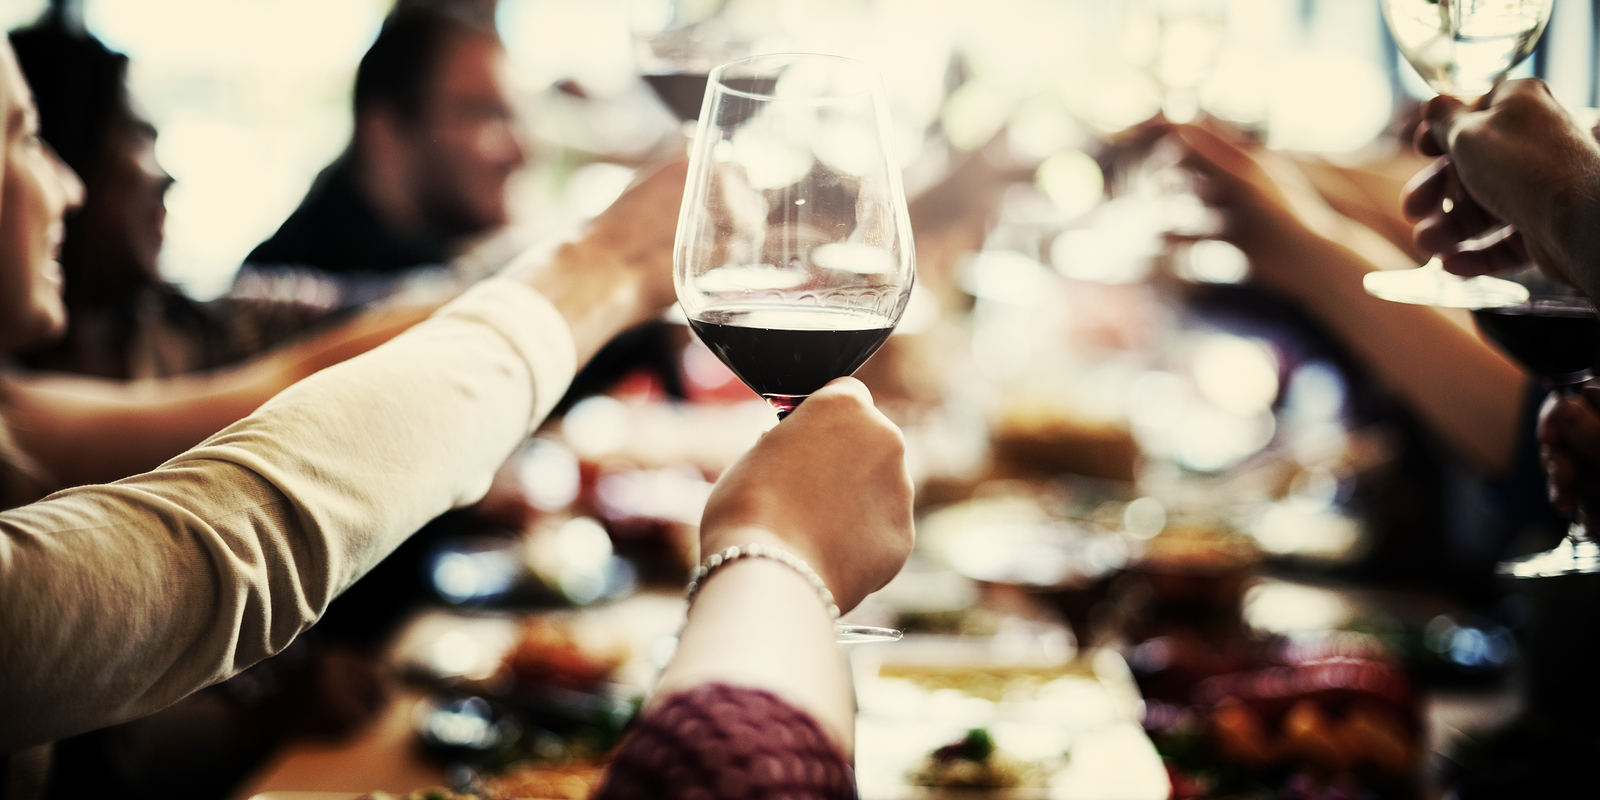 bigstock-Dinner-Dining-Wine-Cheers-Part-136596437.jpg